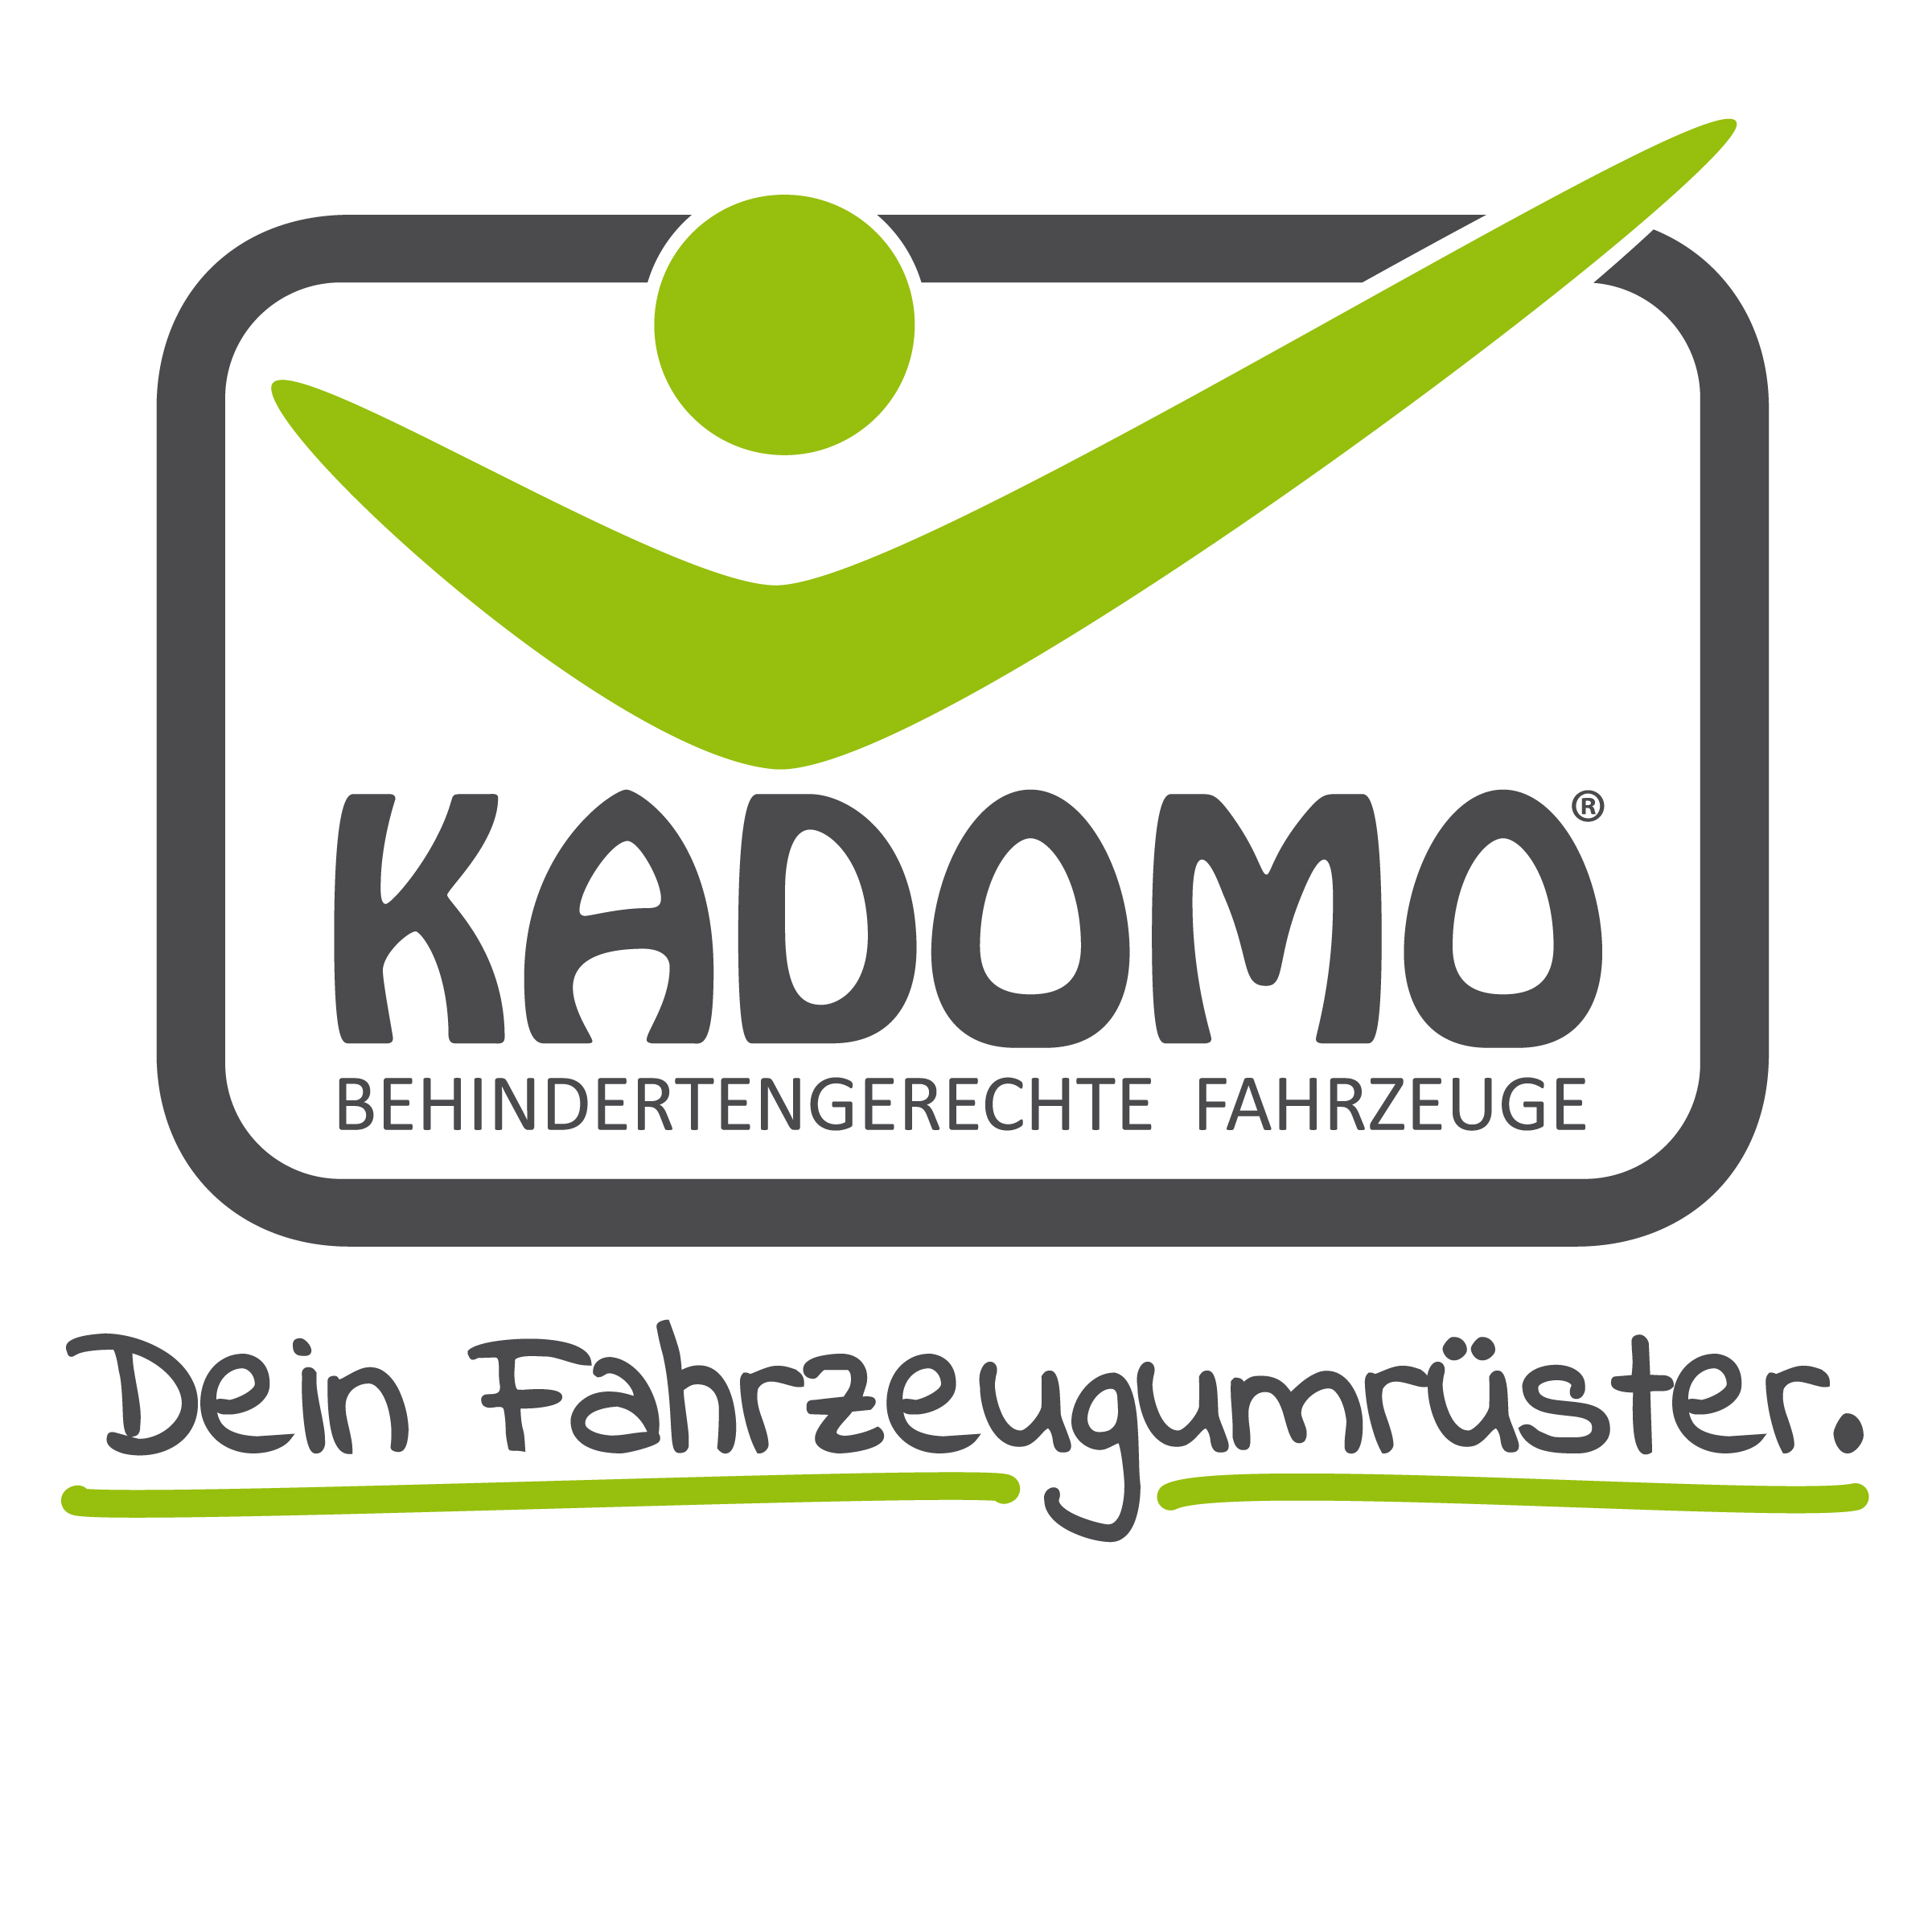 Mobilitätsmanufaktur KADOMO GmbH